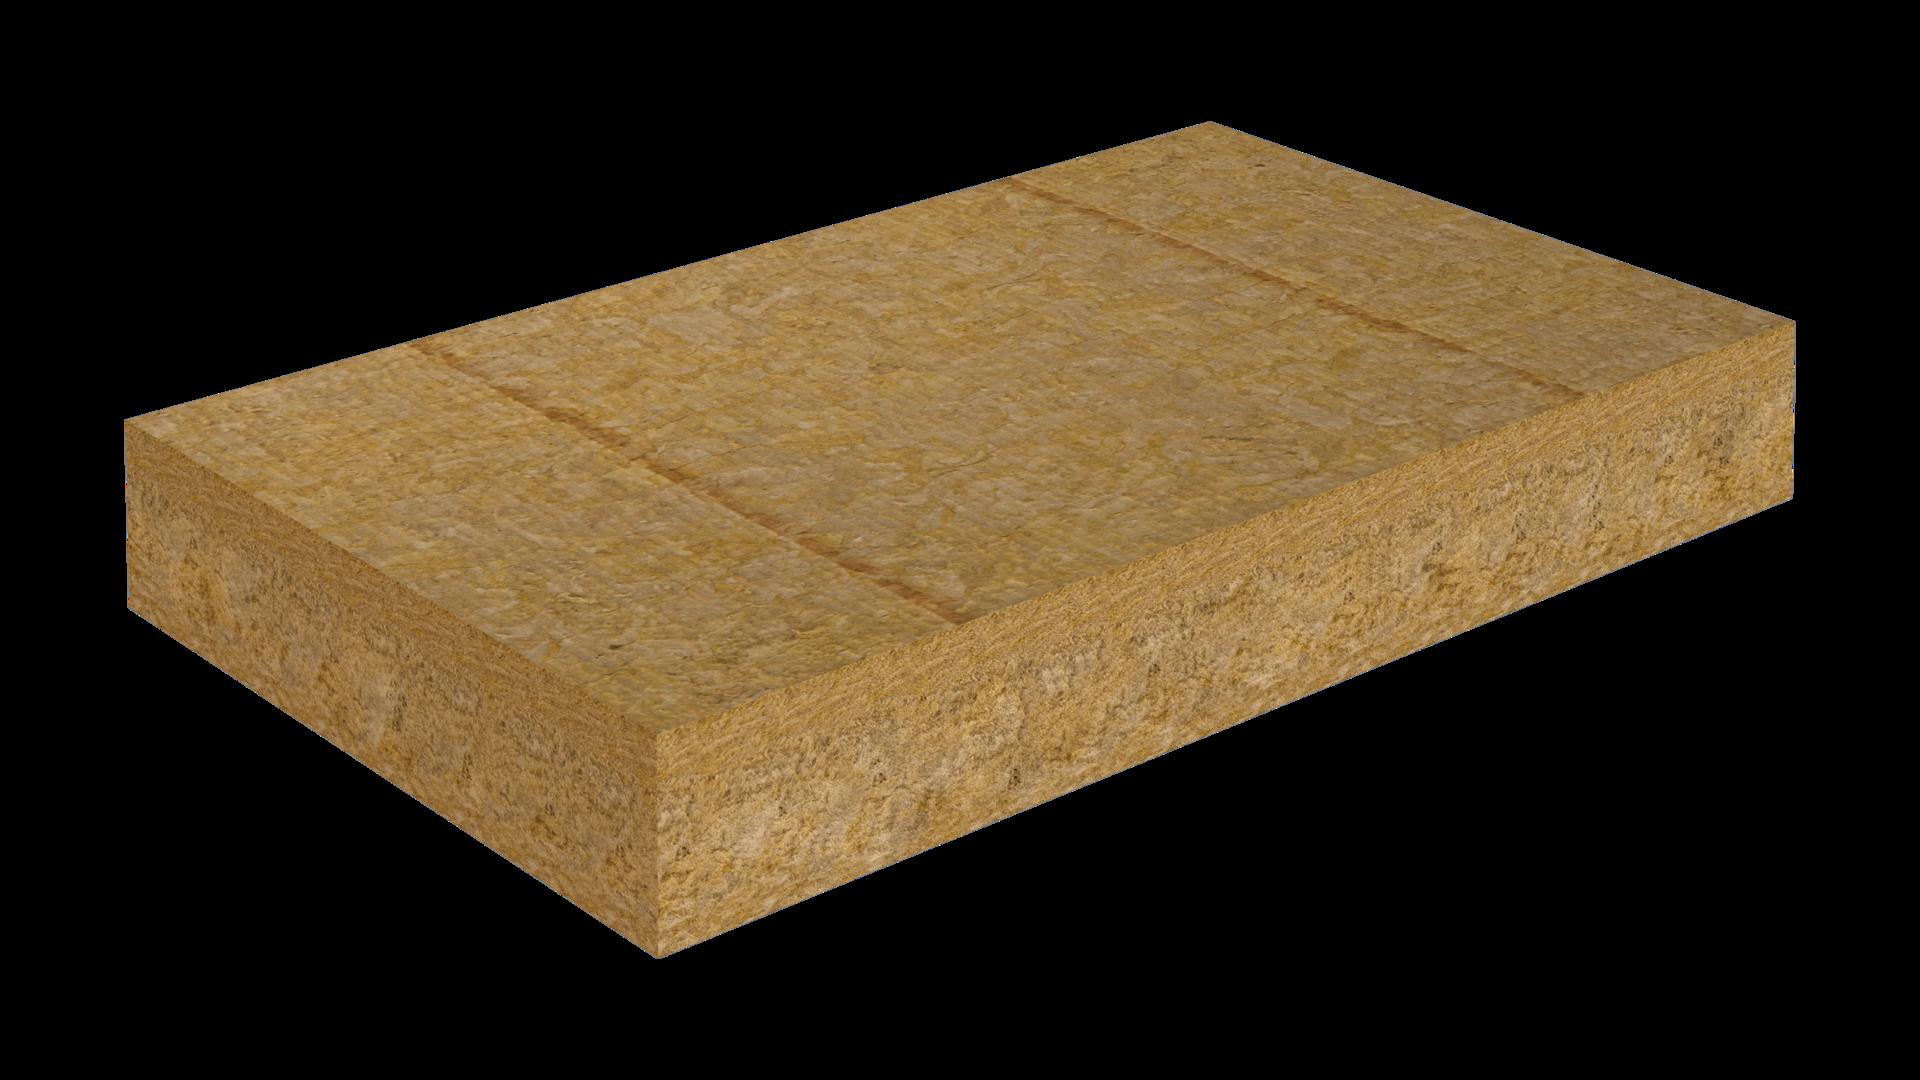 package, product, venti batts, venti batts optima, mats, ventilated facades